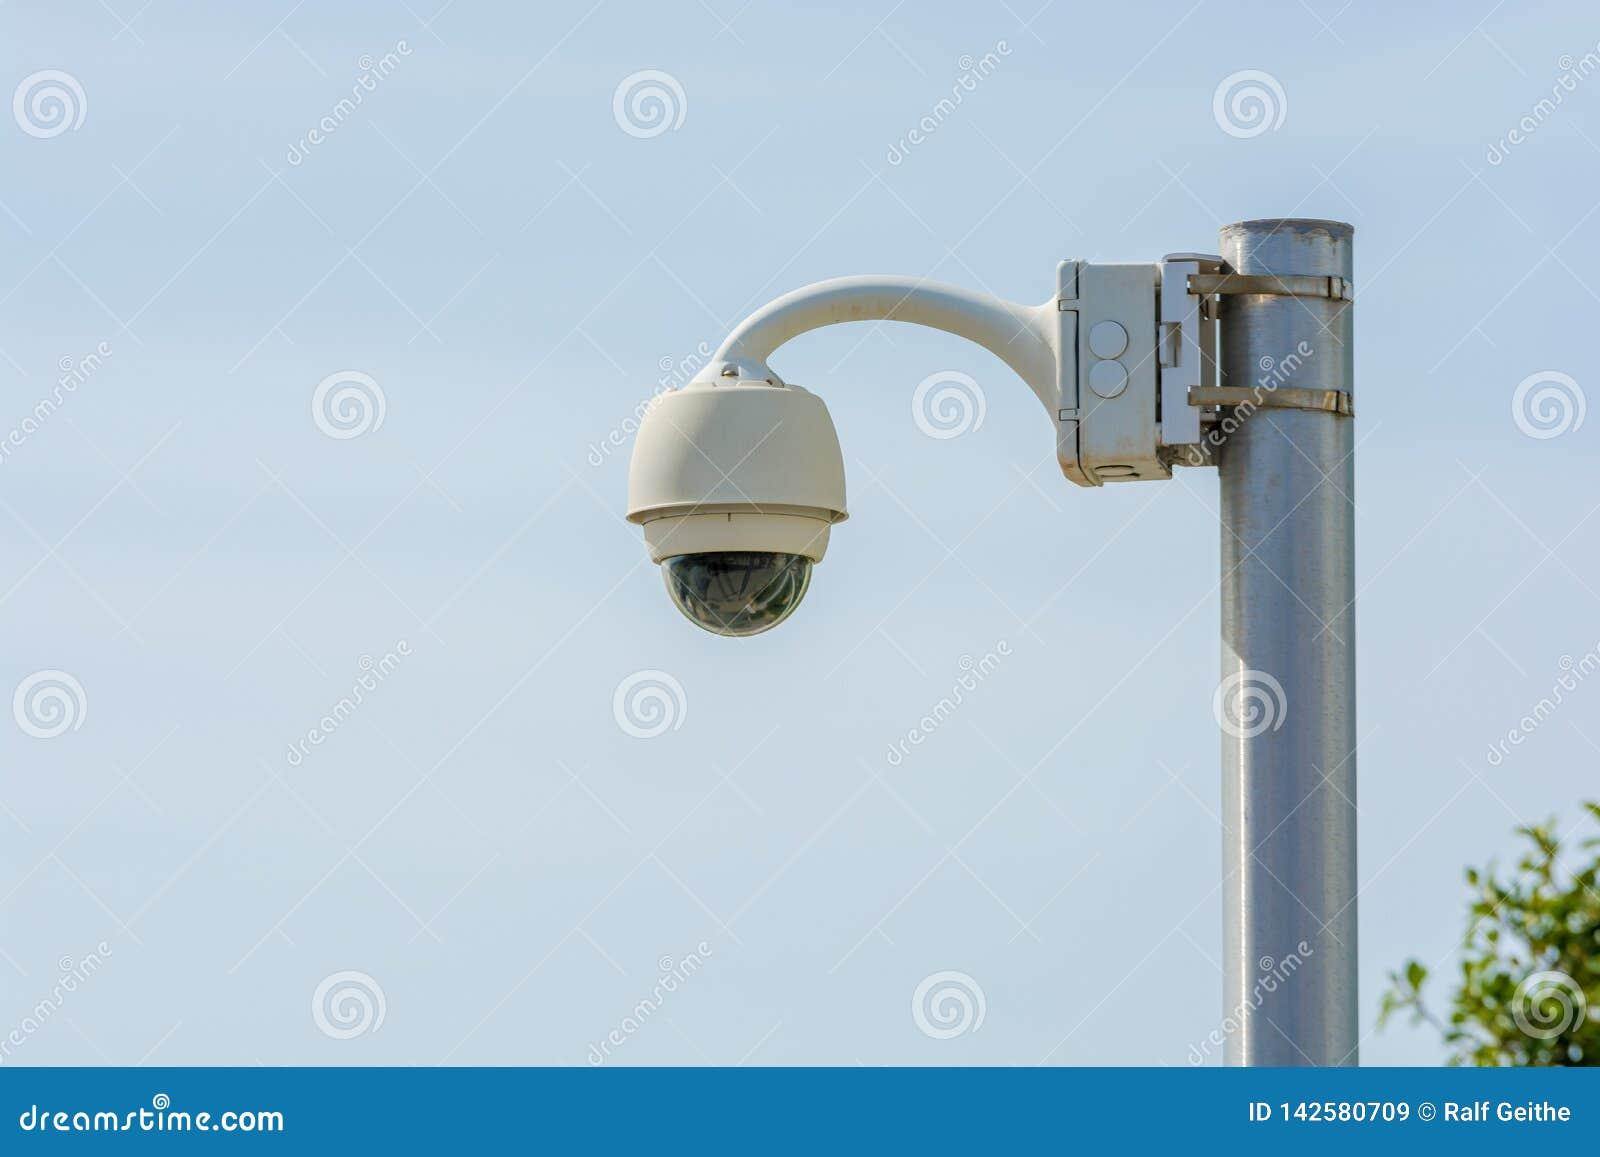 Video surveillance in public spaces